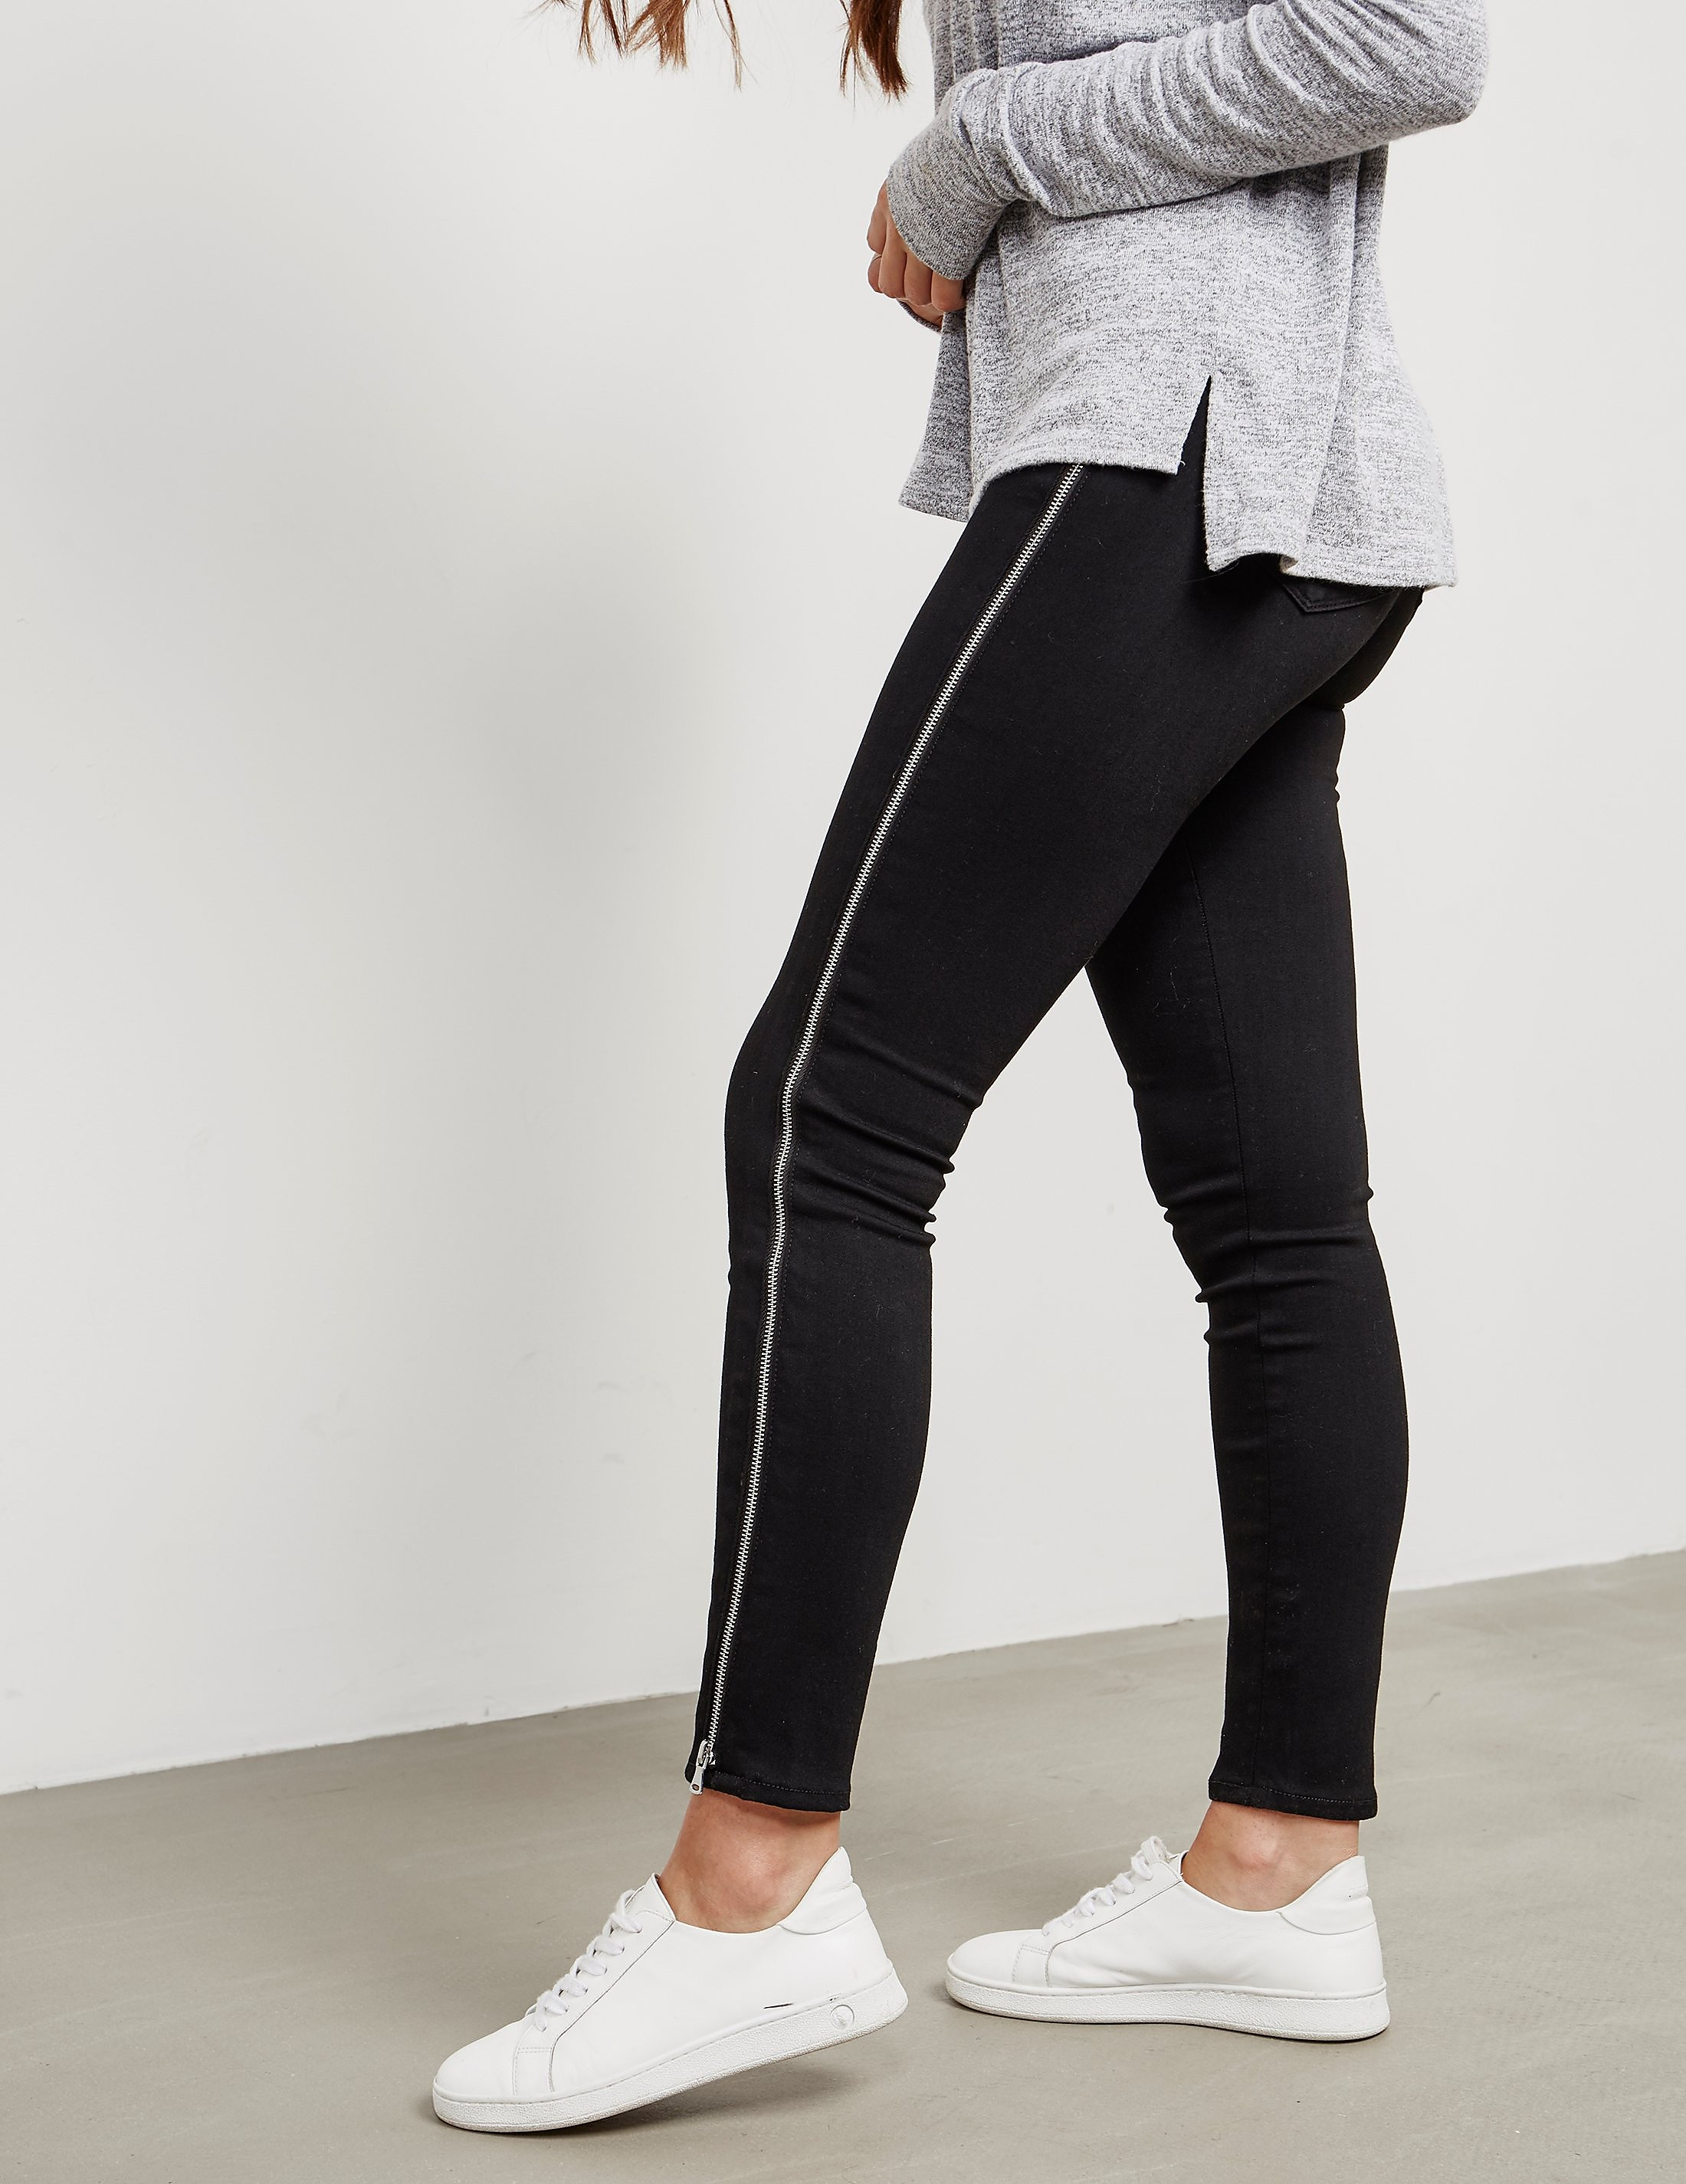 PAIGE Margot Zip Jeans